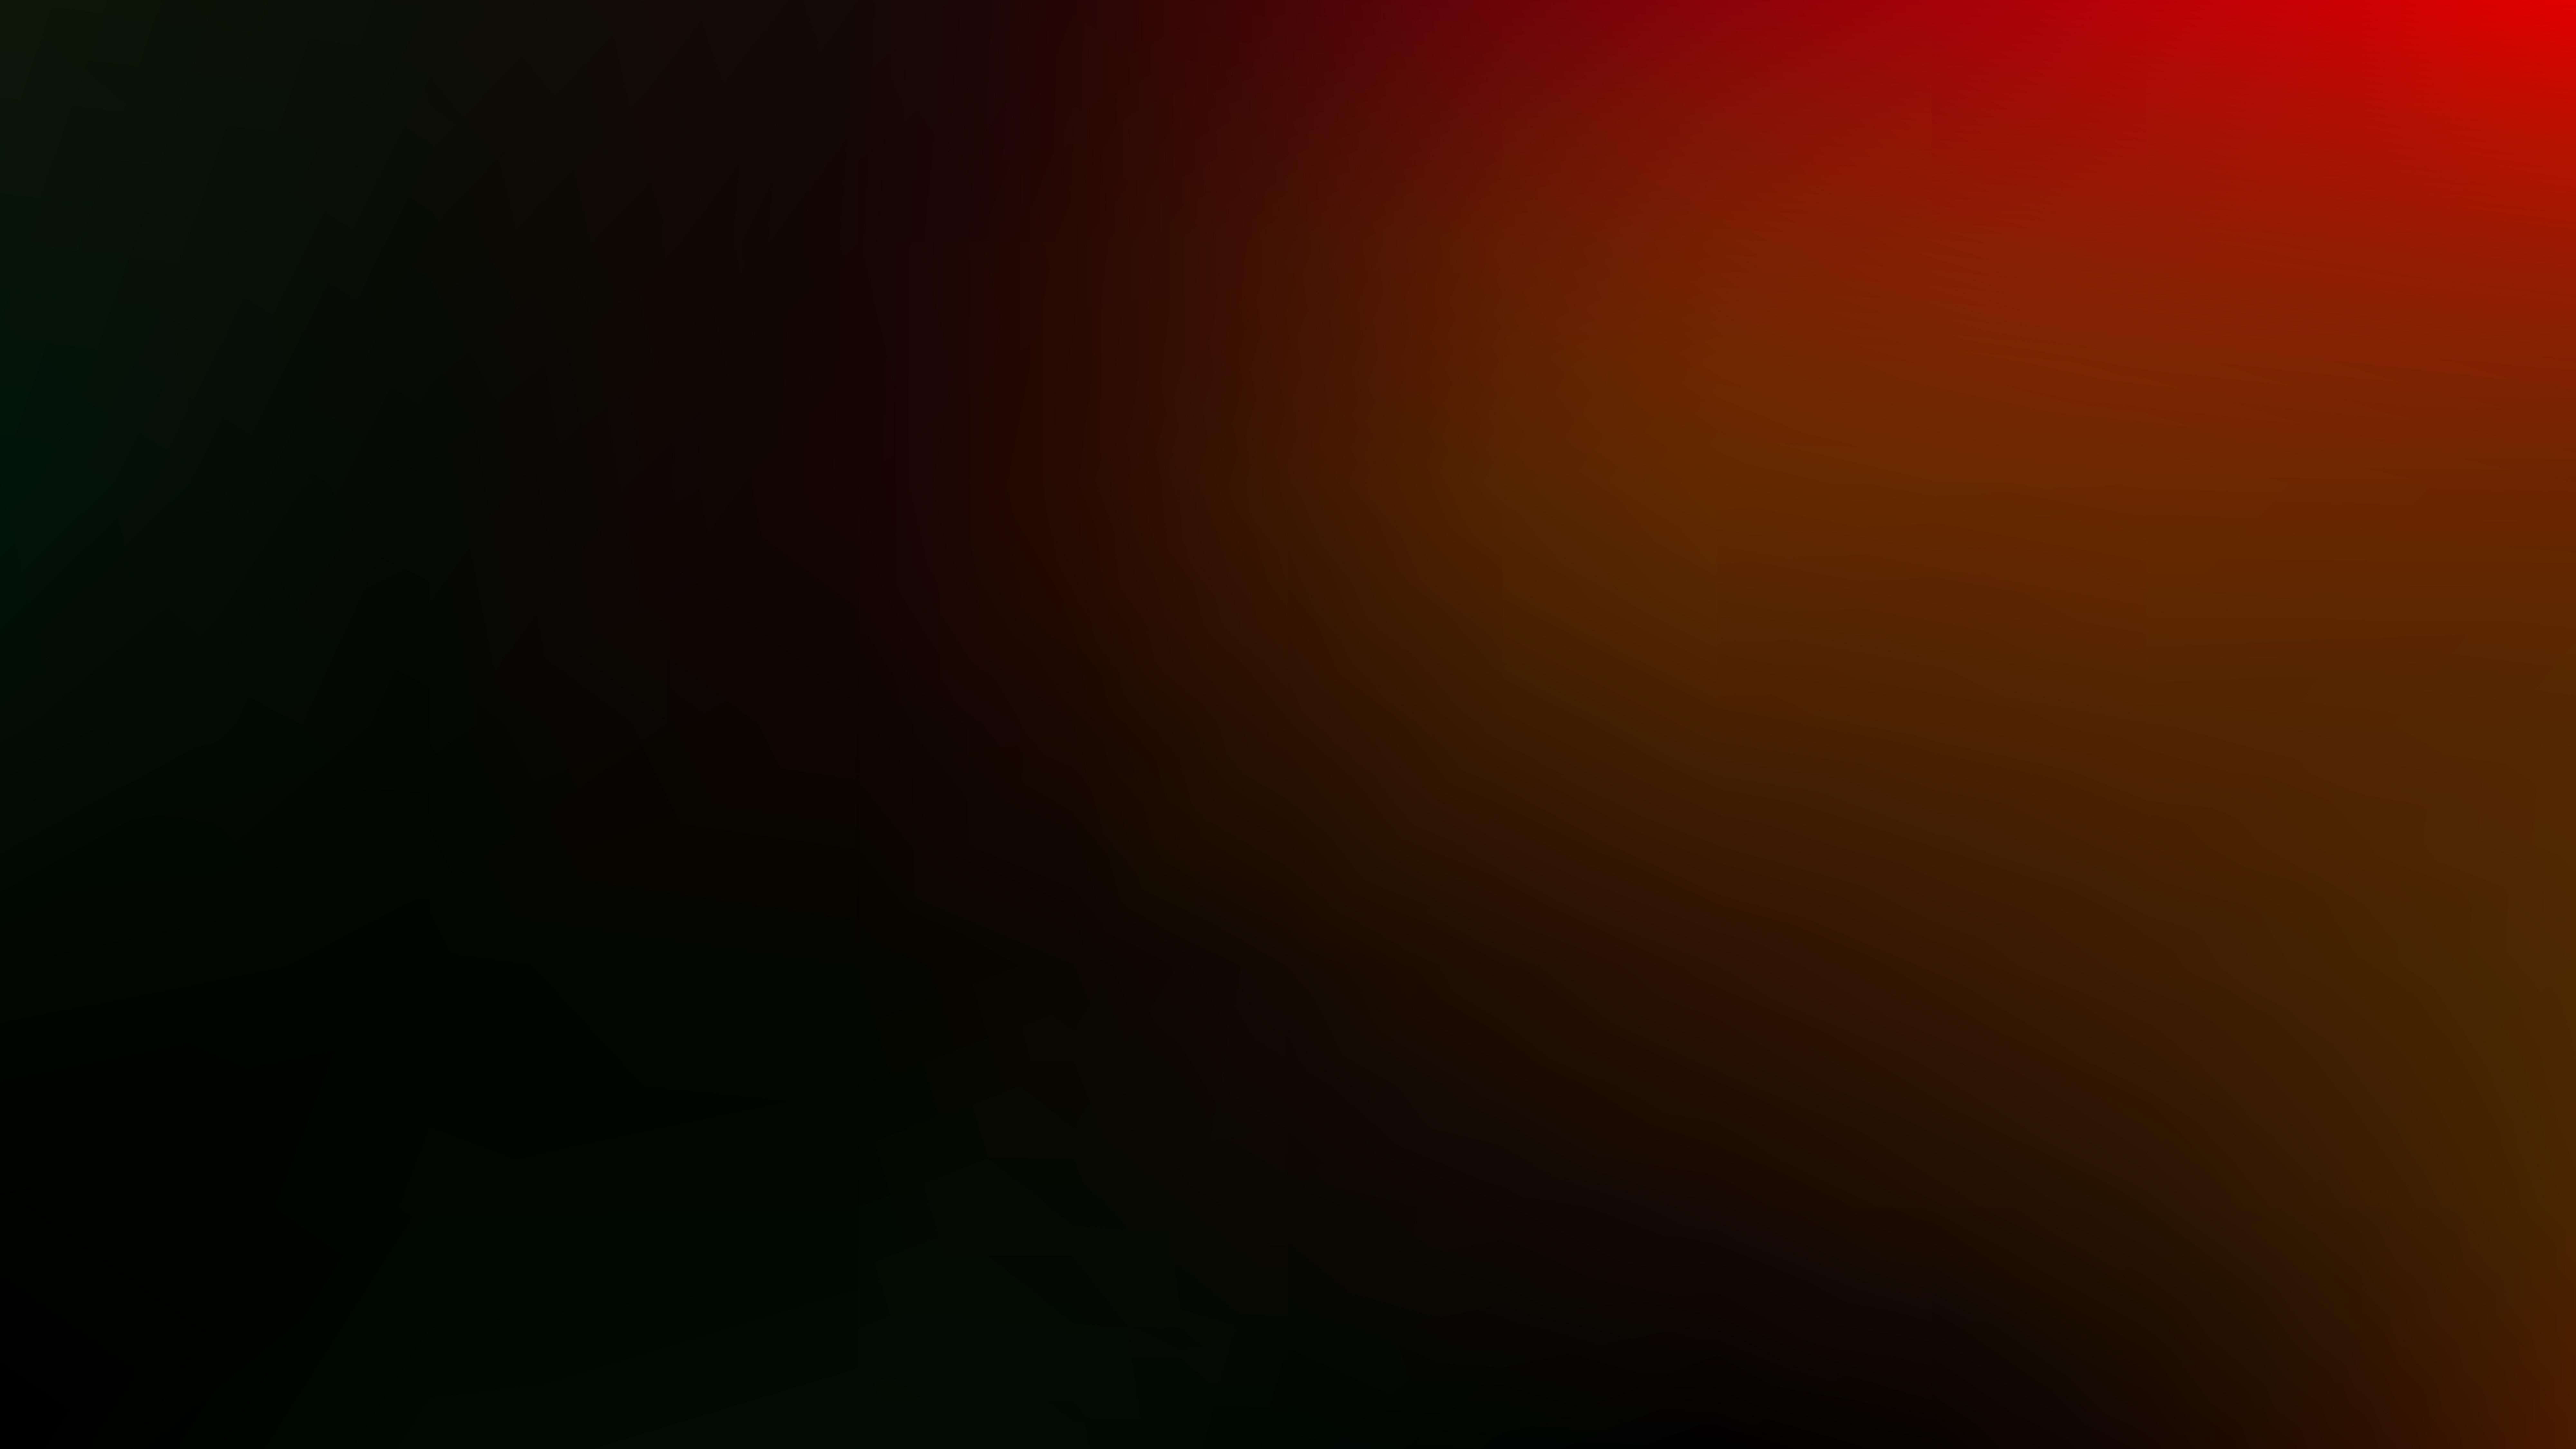 Download 55+ Background Ppt Black HD Paling Keren